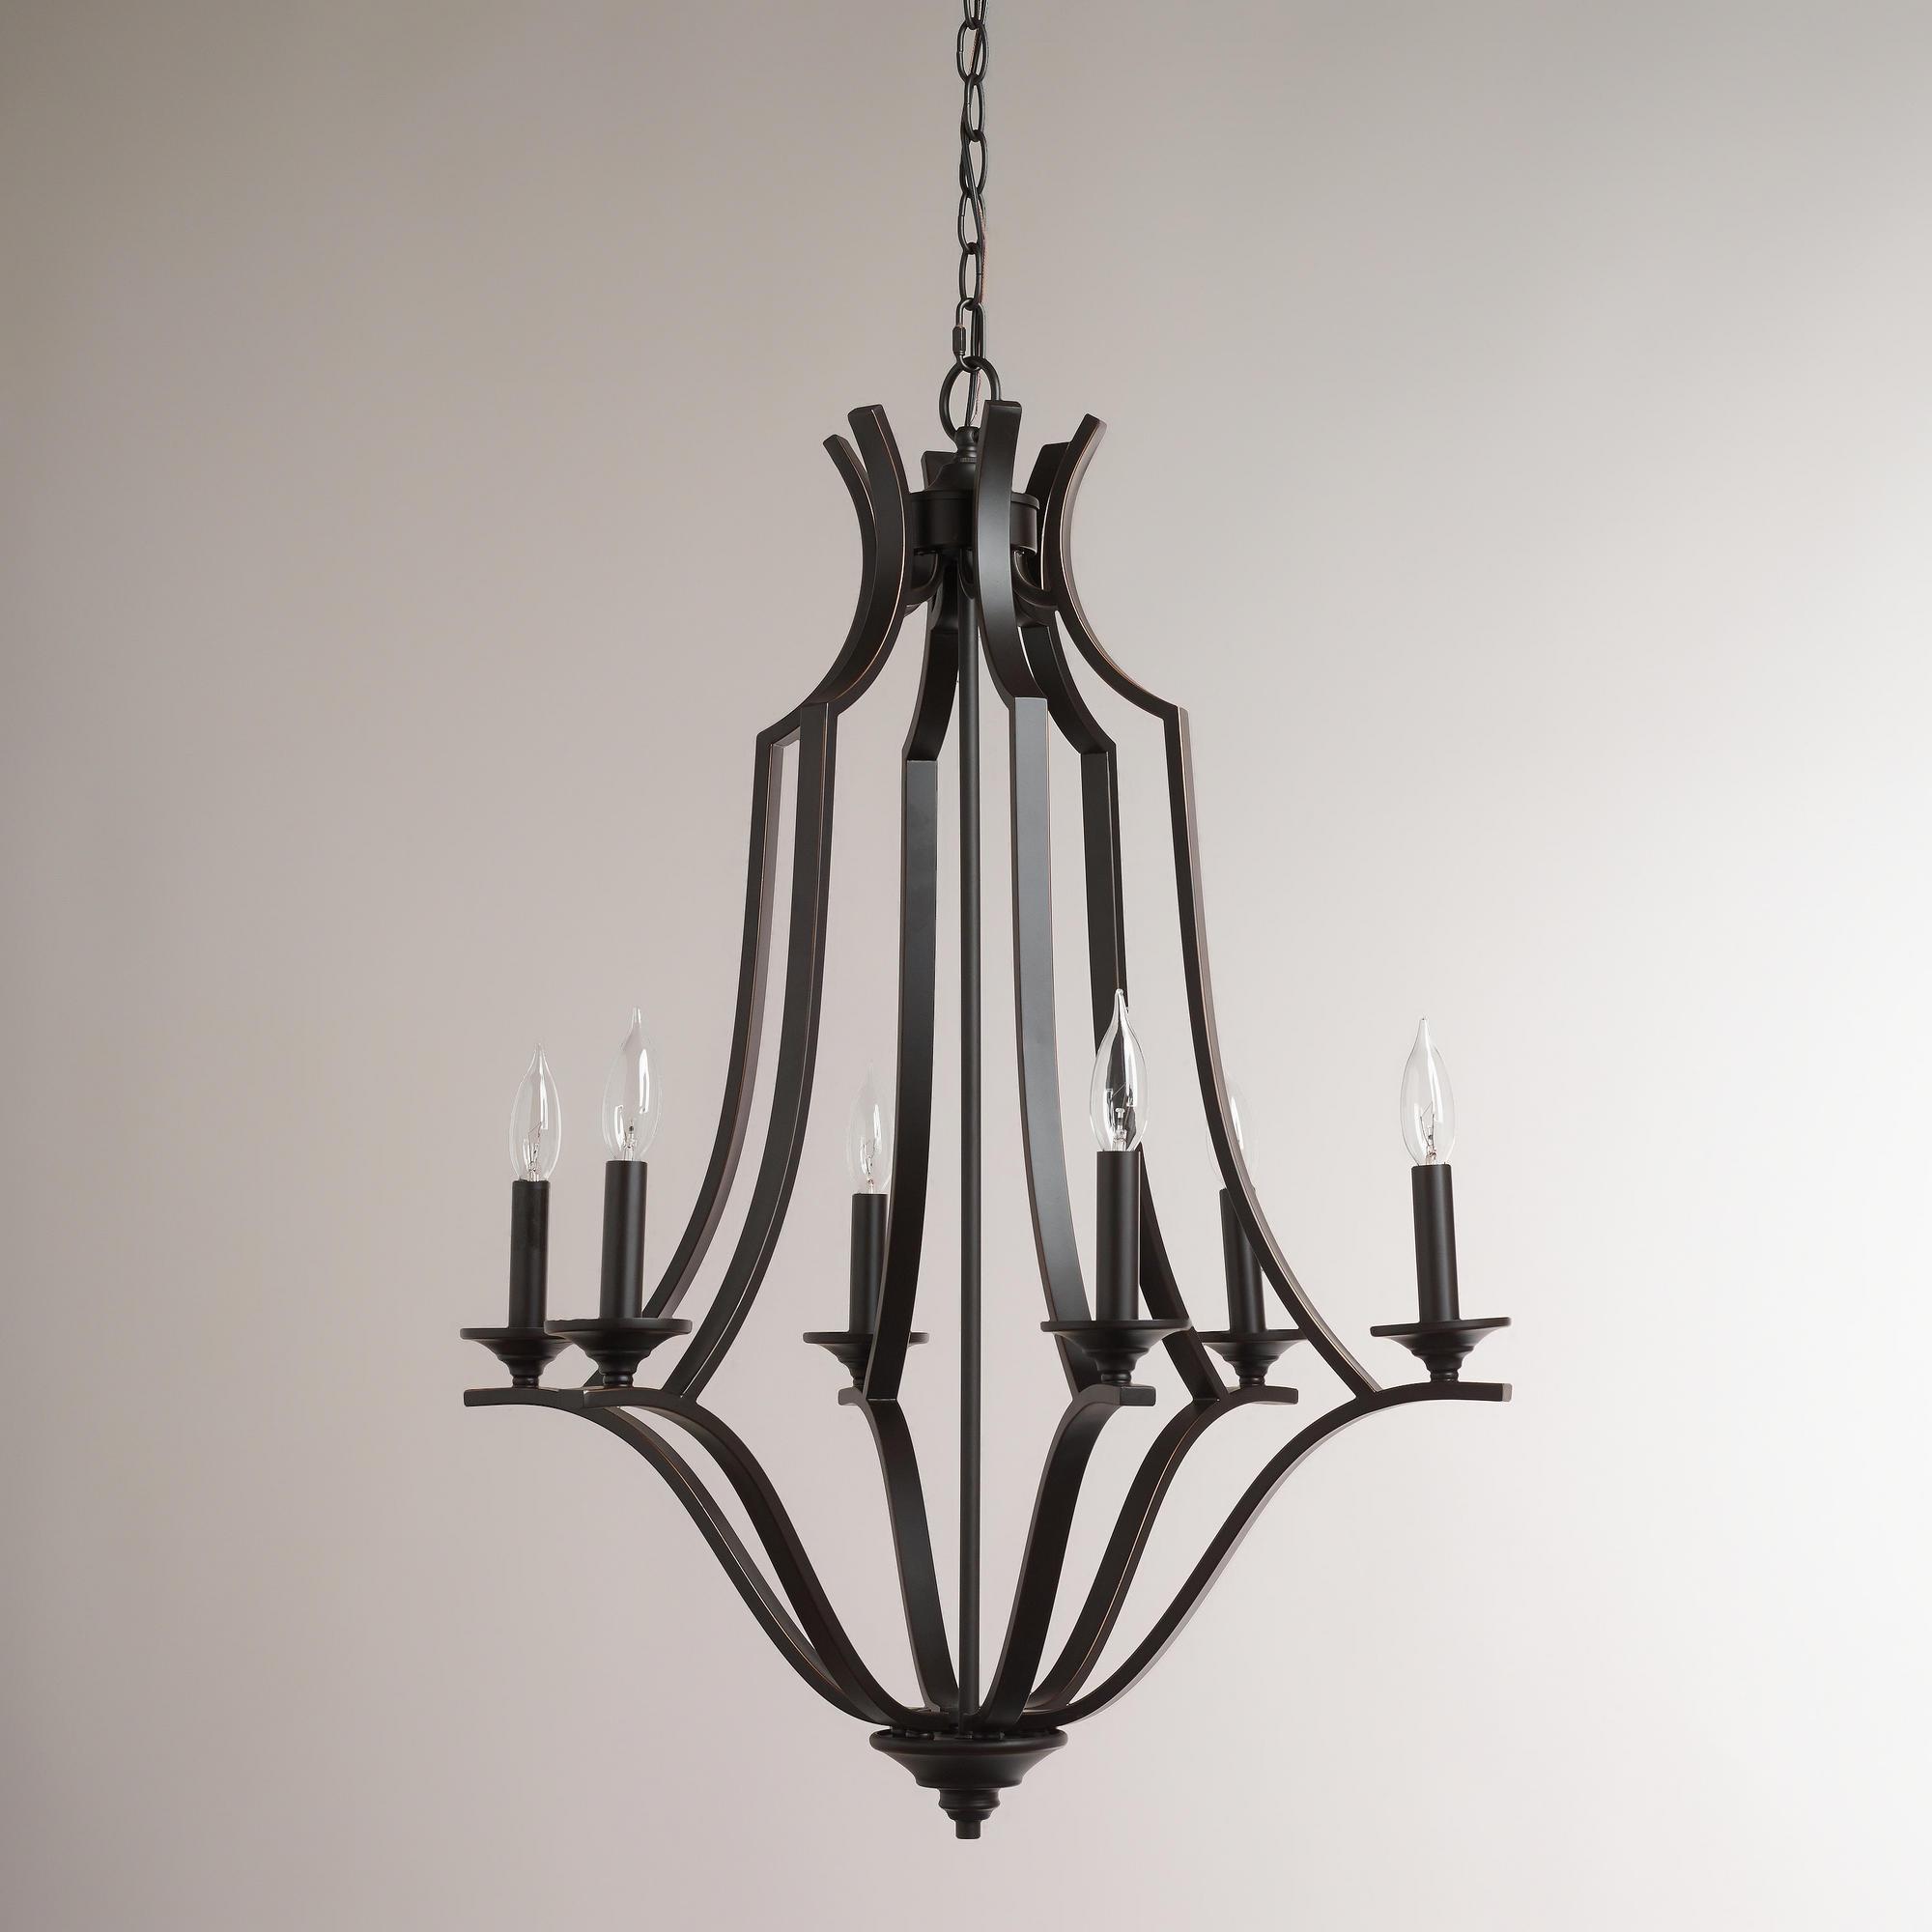 Online Shopping World Market Rardon Designrardon Design Regarding Large Iron Chandelier (#10 of 12)